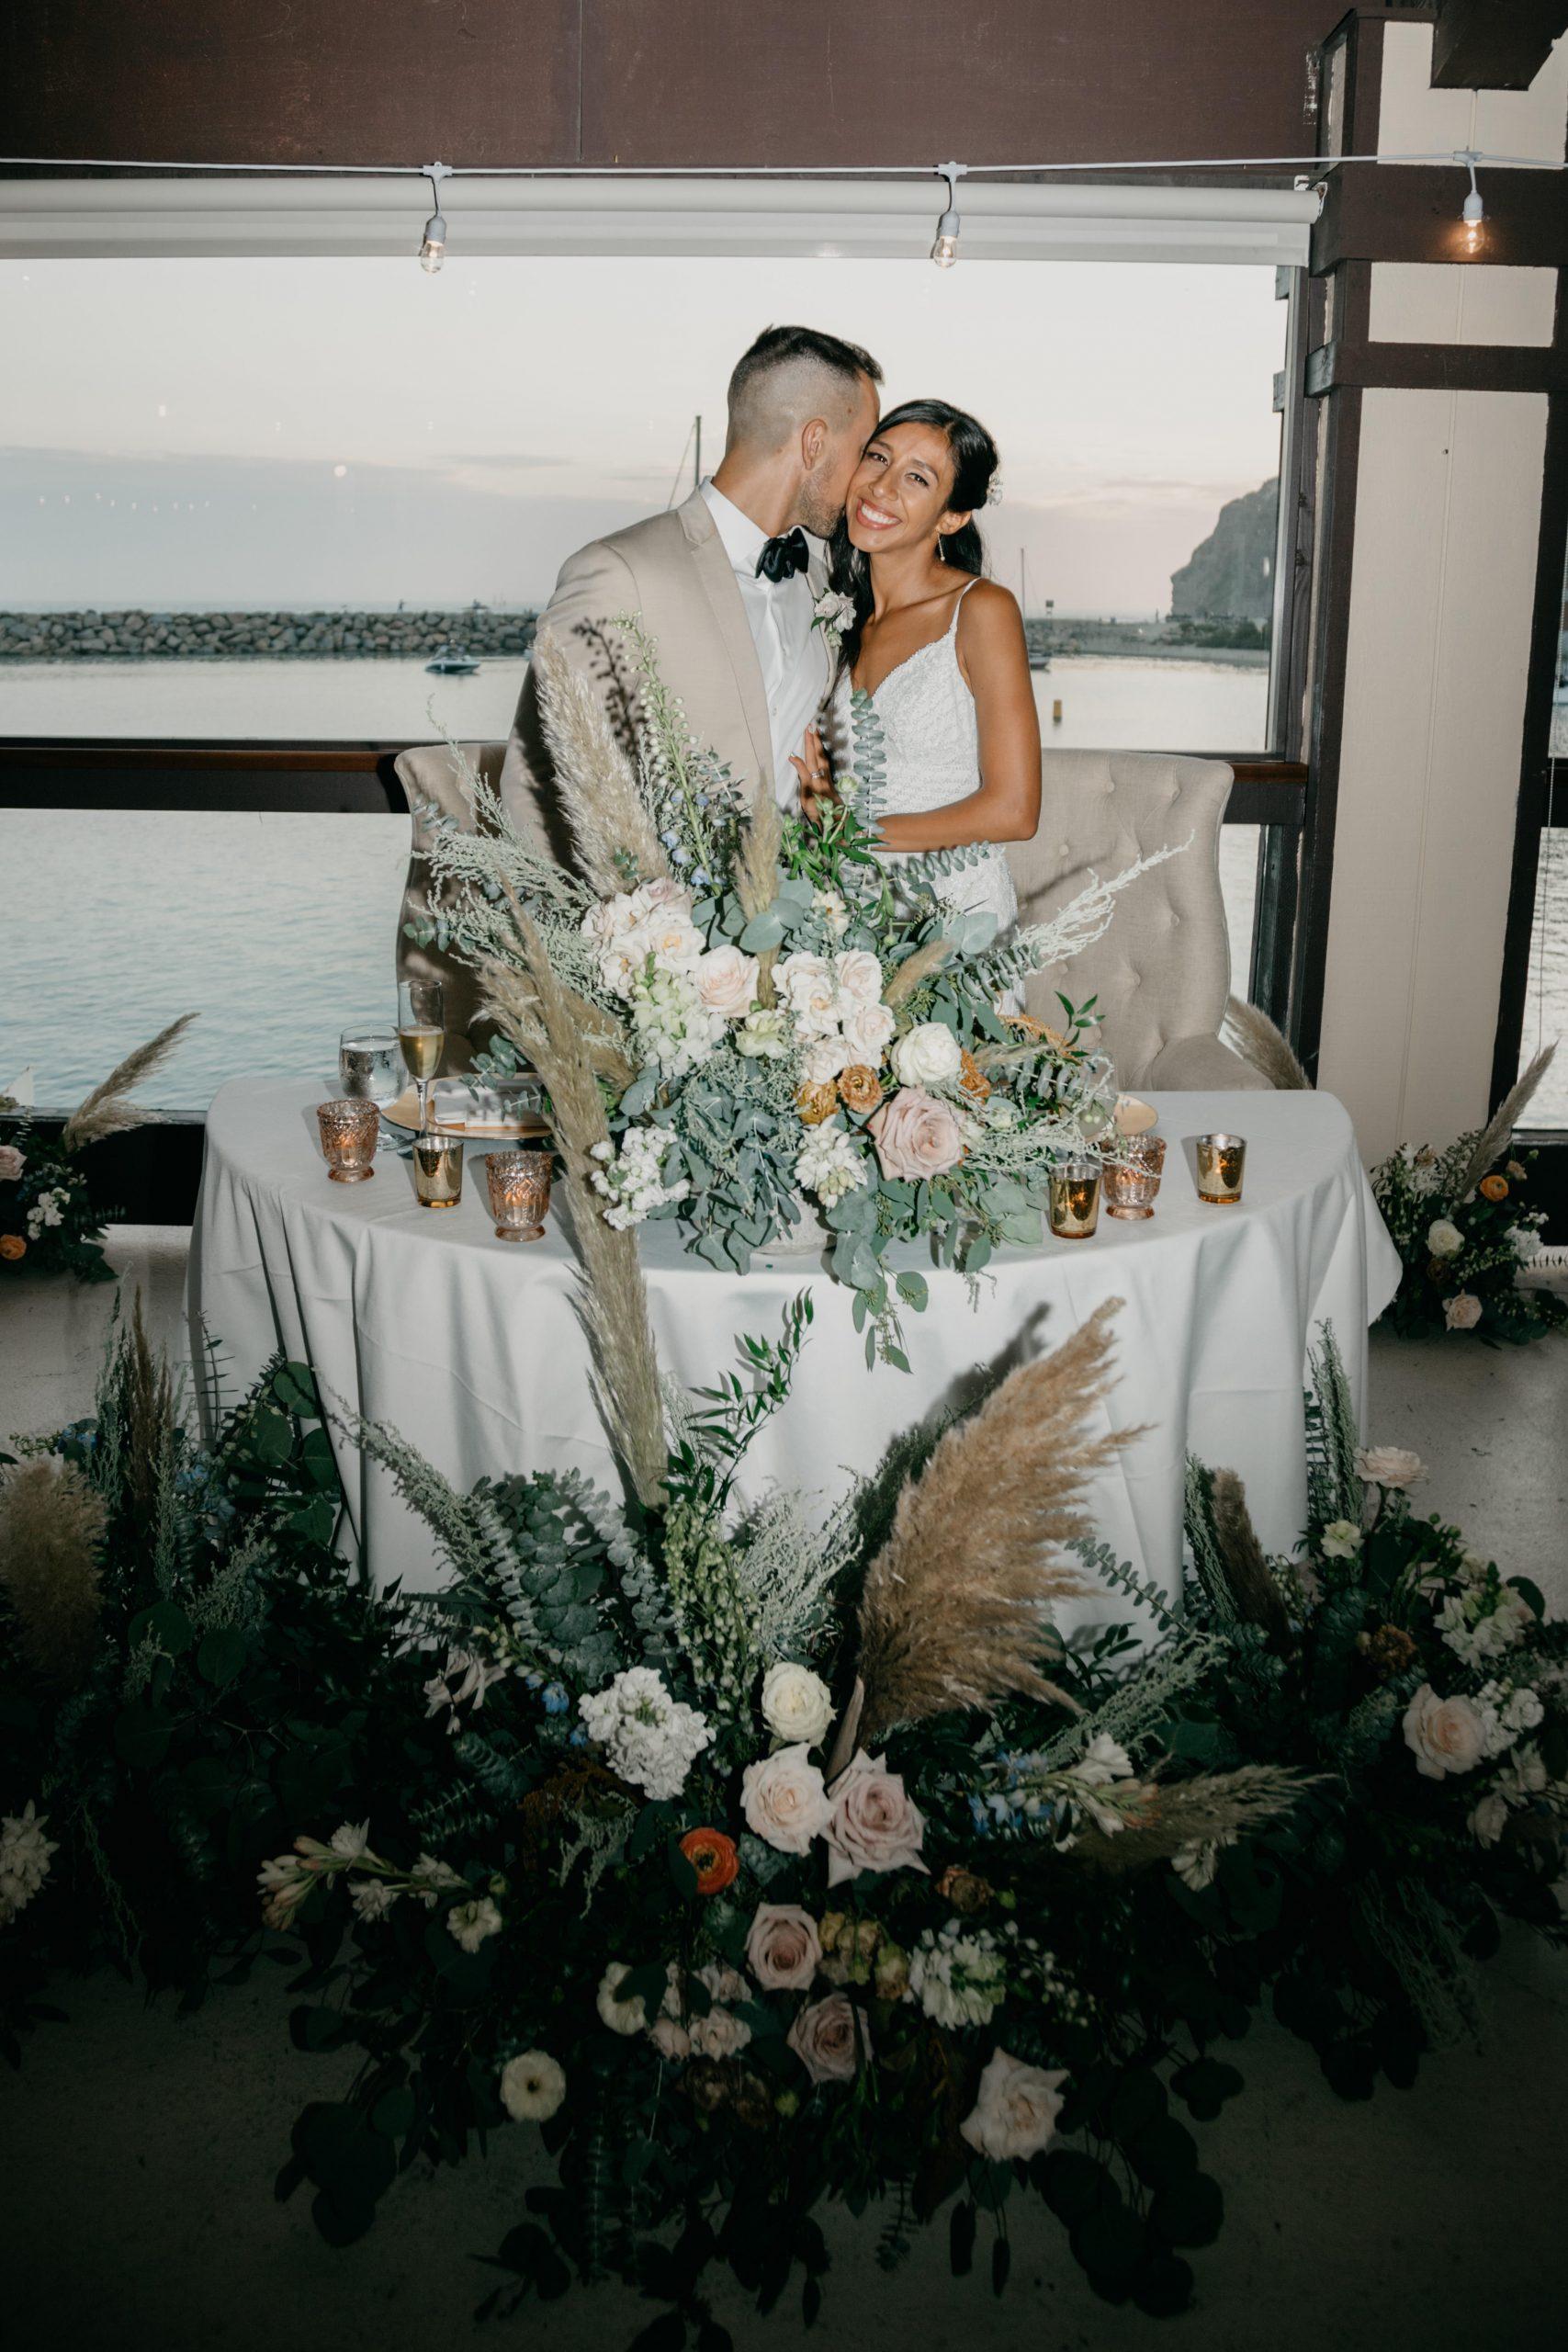 Bride and groom portrait, image by Fatima Elreda Photo